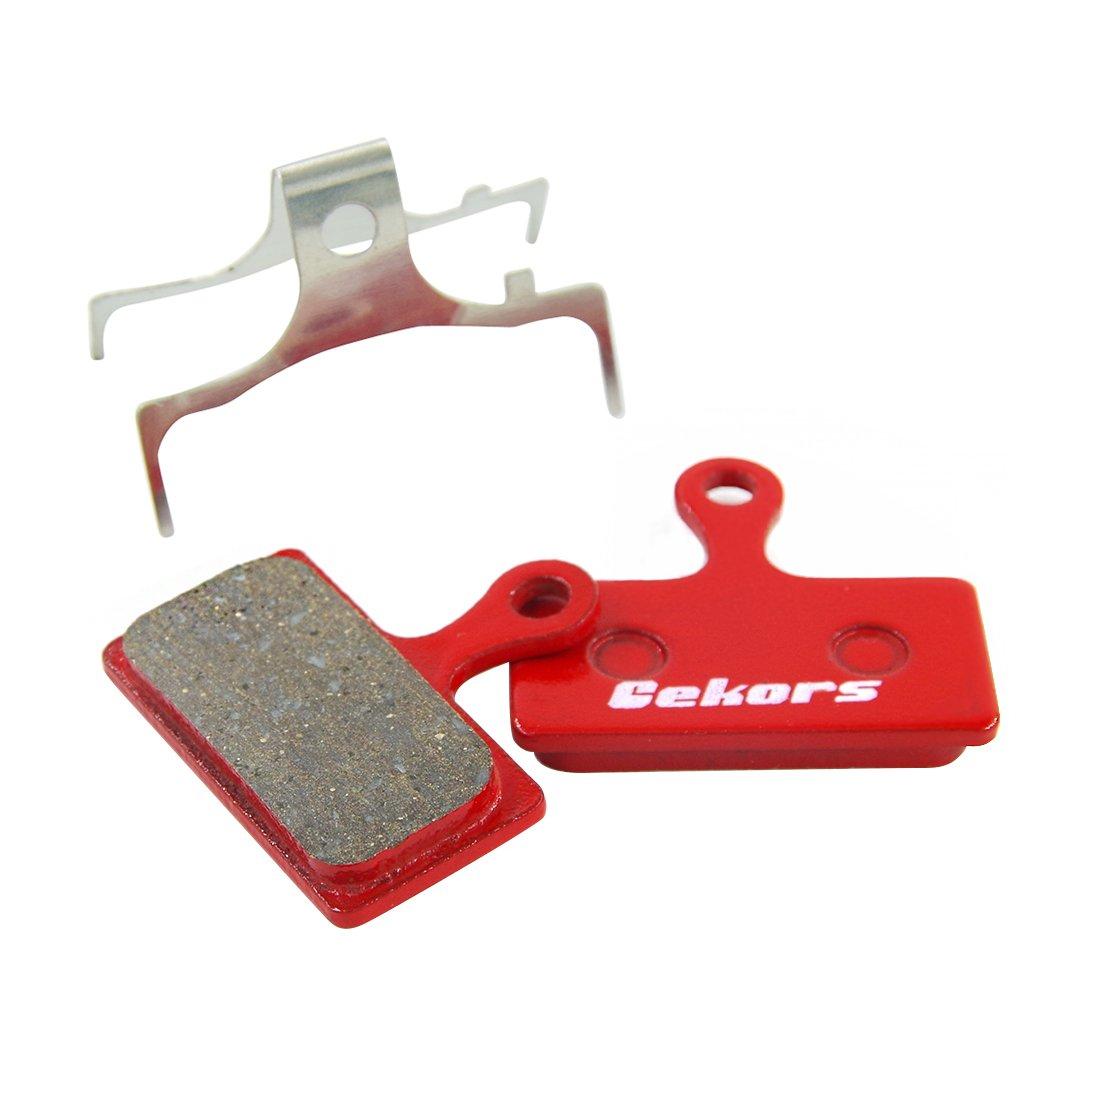 Pastillas de Freno para Disco de Bicicleta para Shimano M985//M988//M785//M675//M666//M615//S700 Gekors Ceramic 1 par